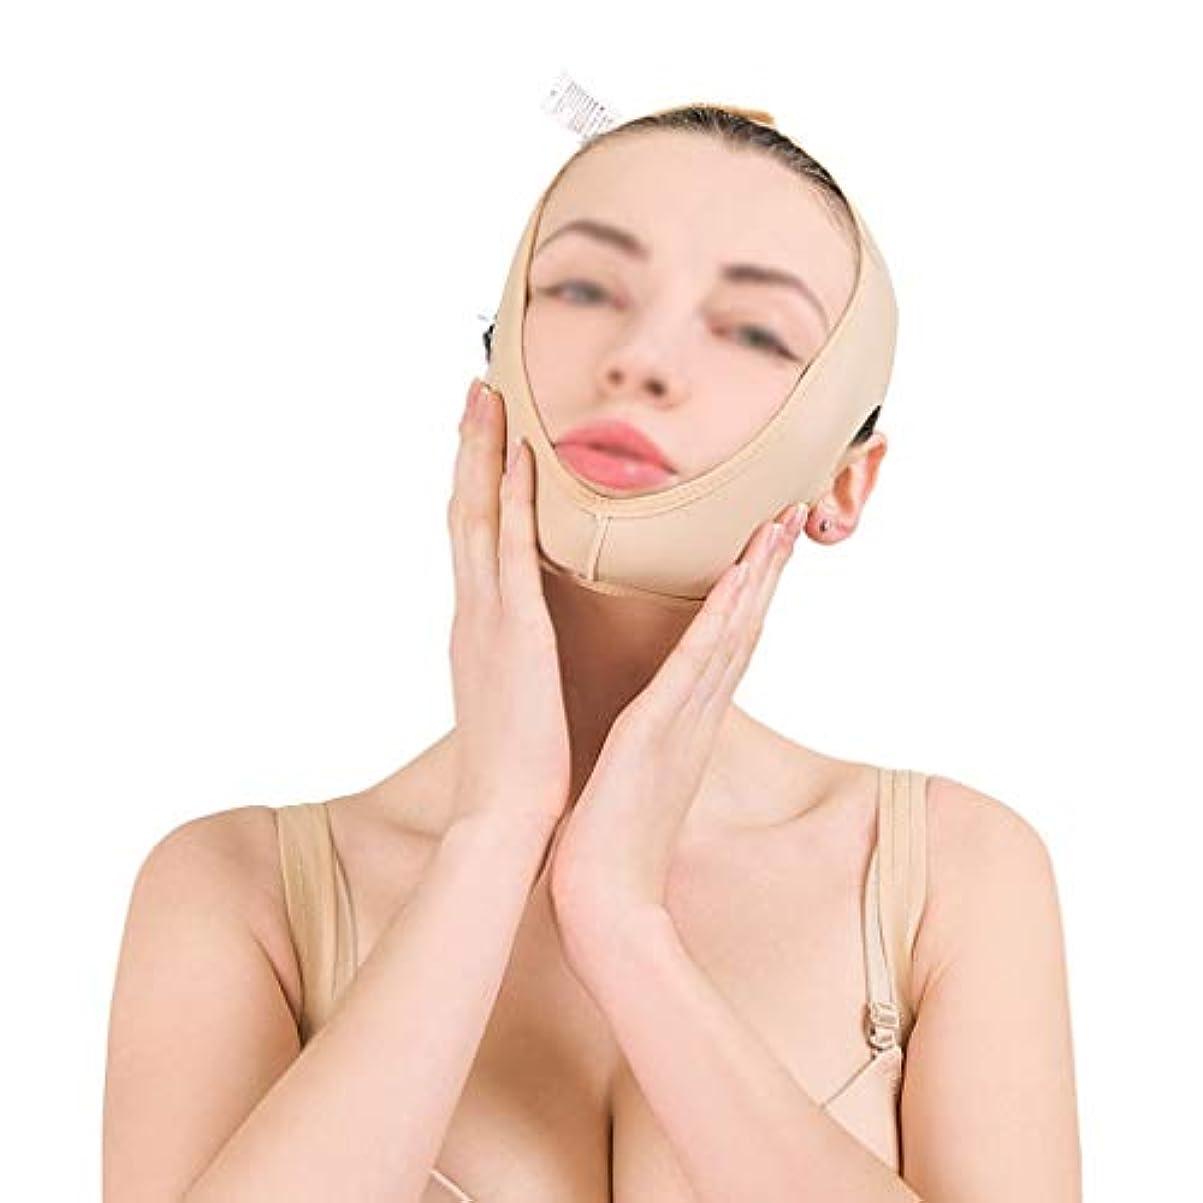 XHLMRMJ マスクの減量、肌の包帯を引き締めるフェイスバンドを持ち上げる、フェイスリフティング、二重あごの美容包帯、フェイスリフト (Size : S)